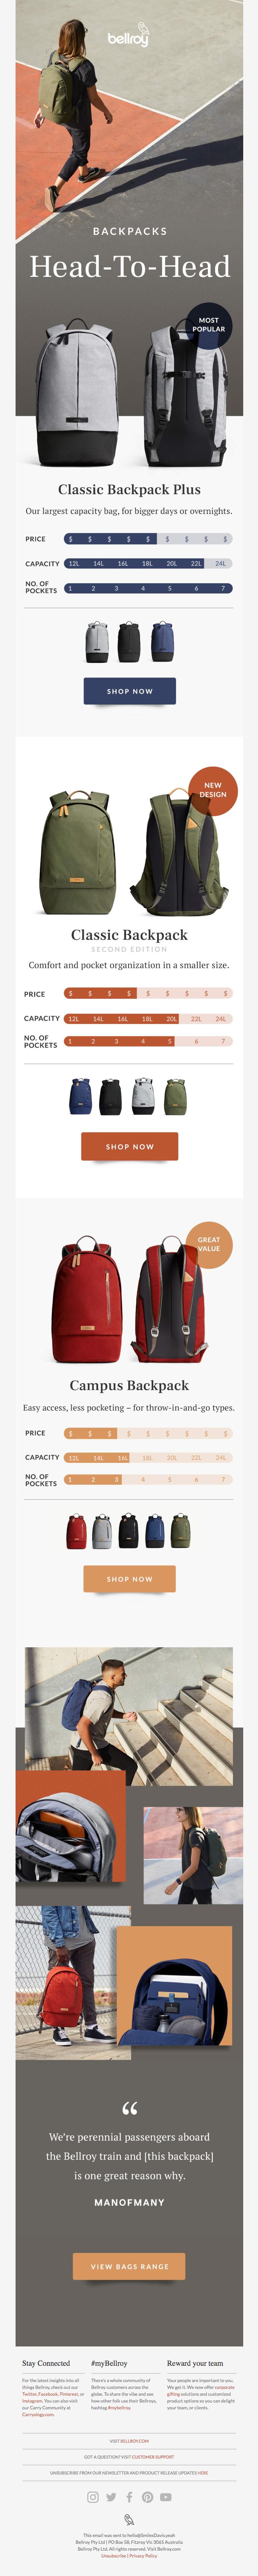 Three classic backpacks, head to head.